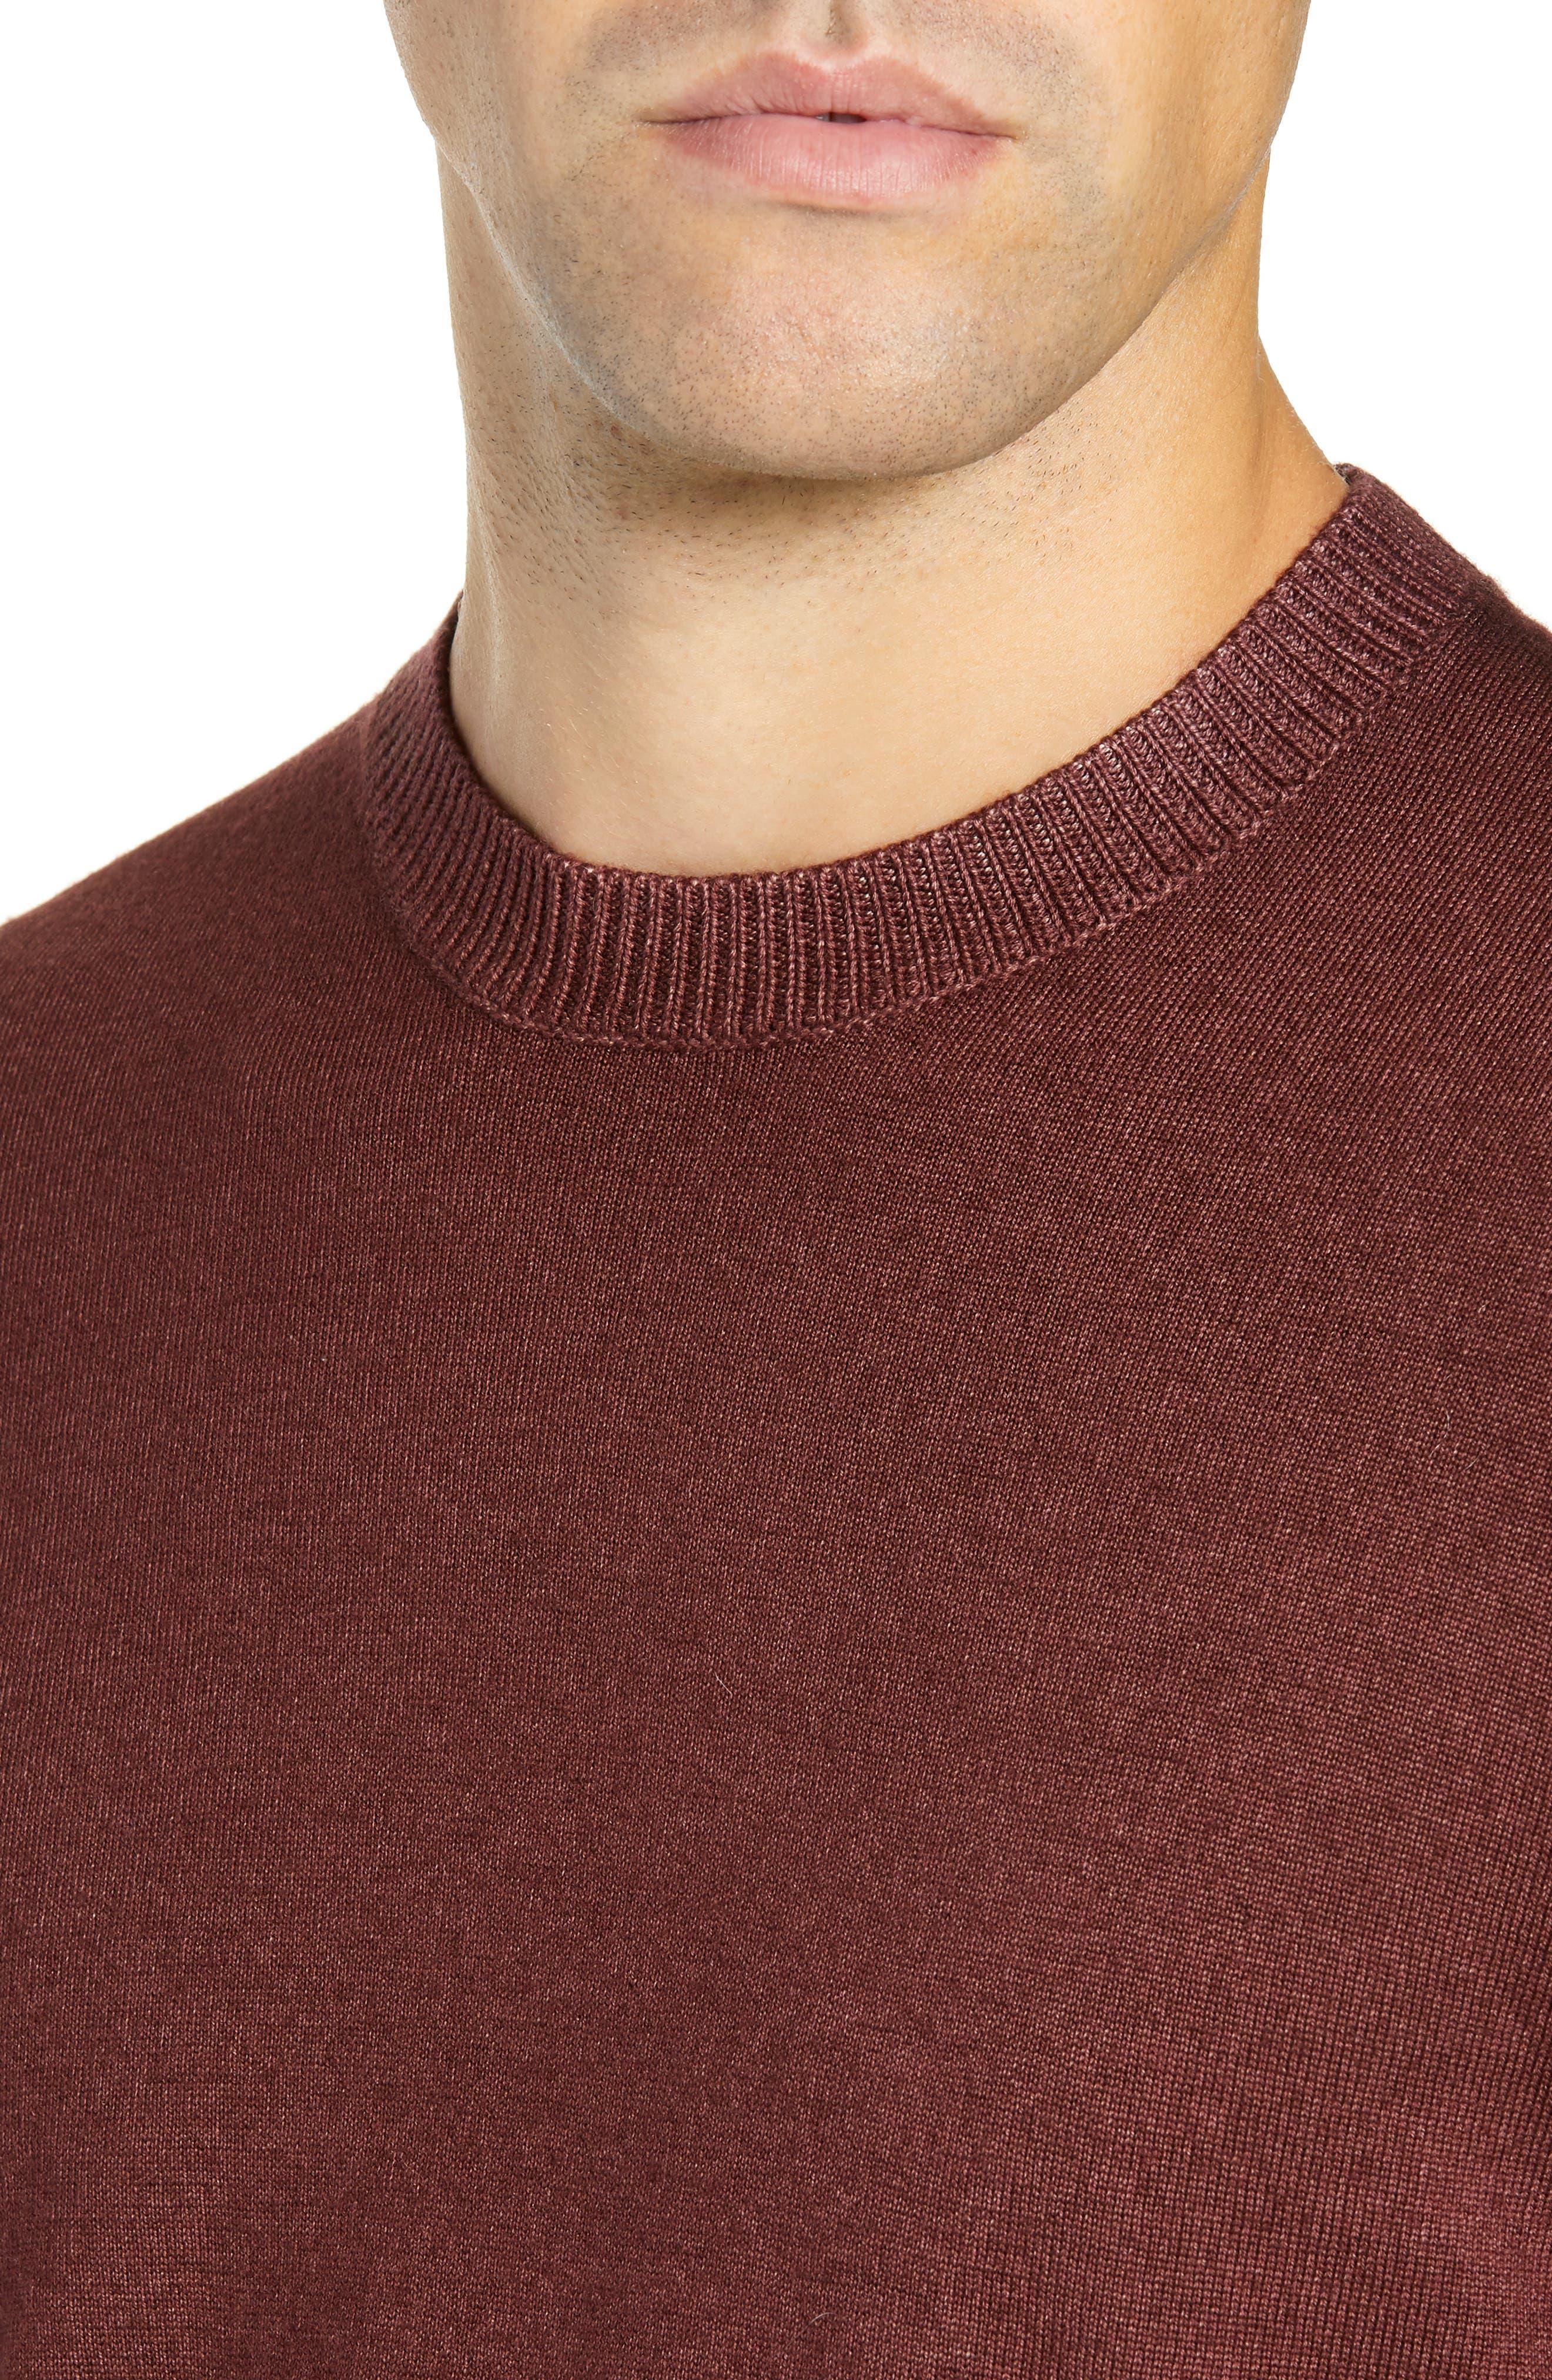 Trim Fit Newab Garment Dyed Wool Sweater,                             Alternate thumbnail 4, color,                             MAROON